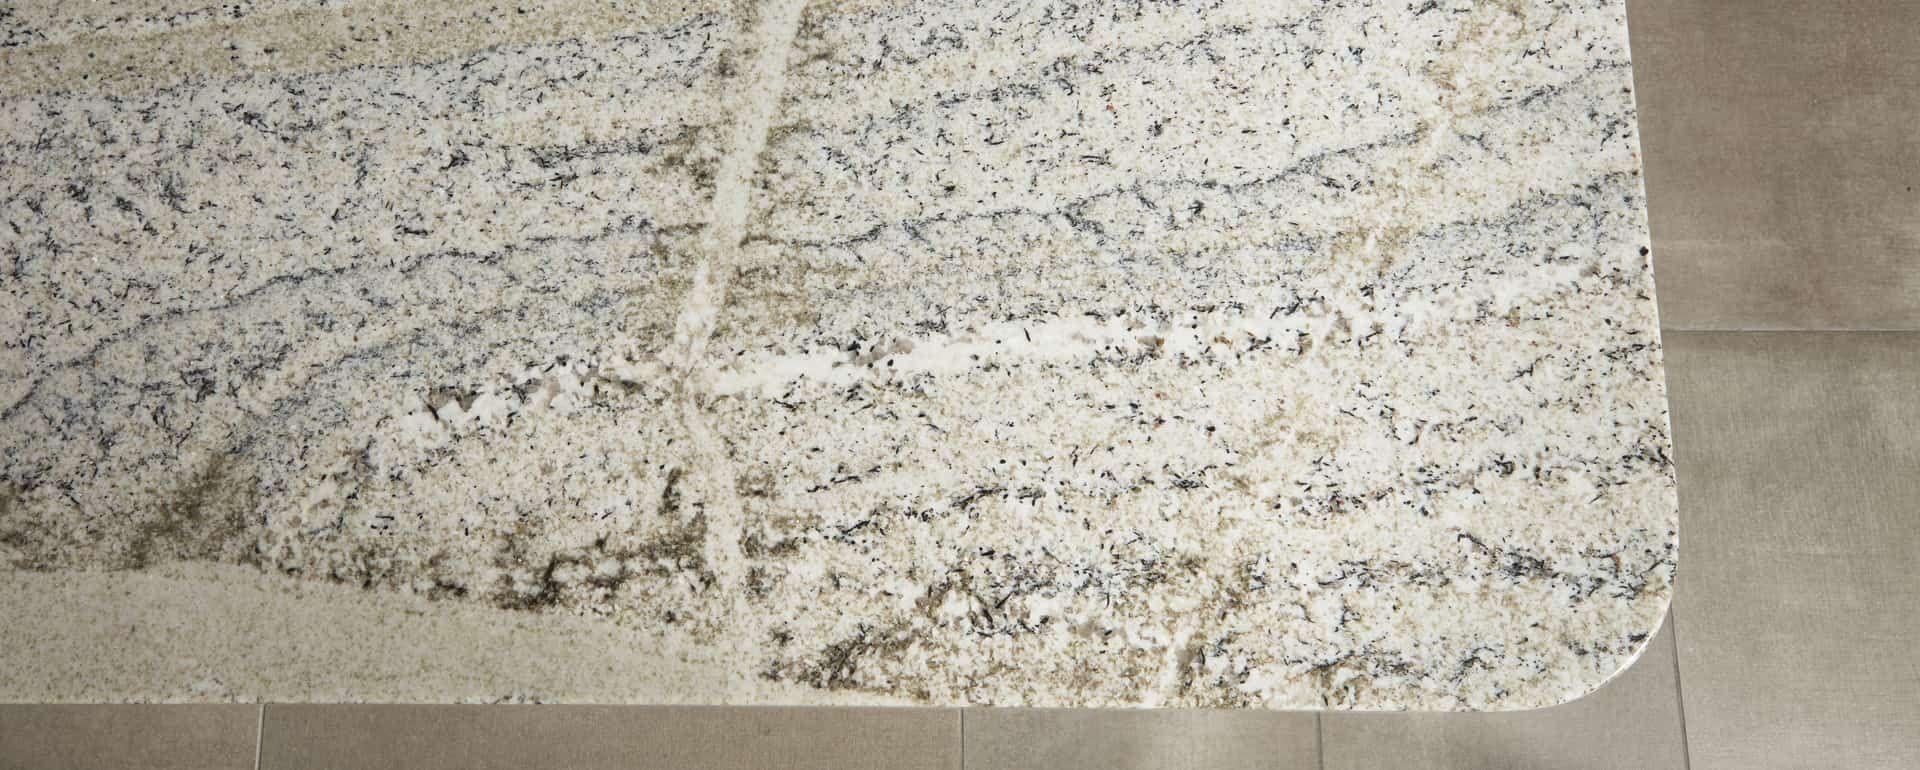 Monte cristo polished natural stone granite arizona tile monte cristo polished natural stone granite arizona tile tyukafo